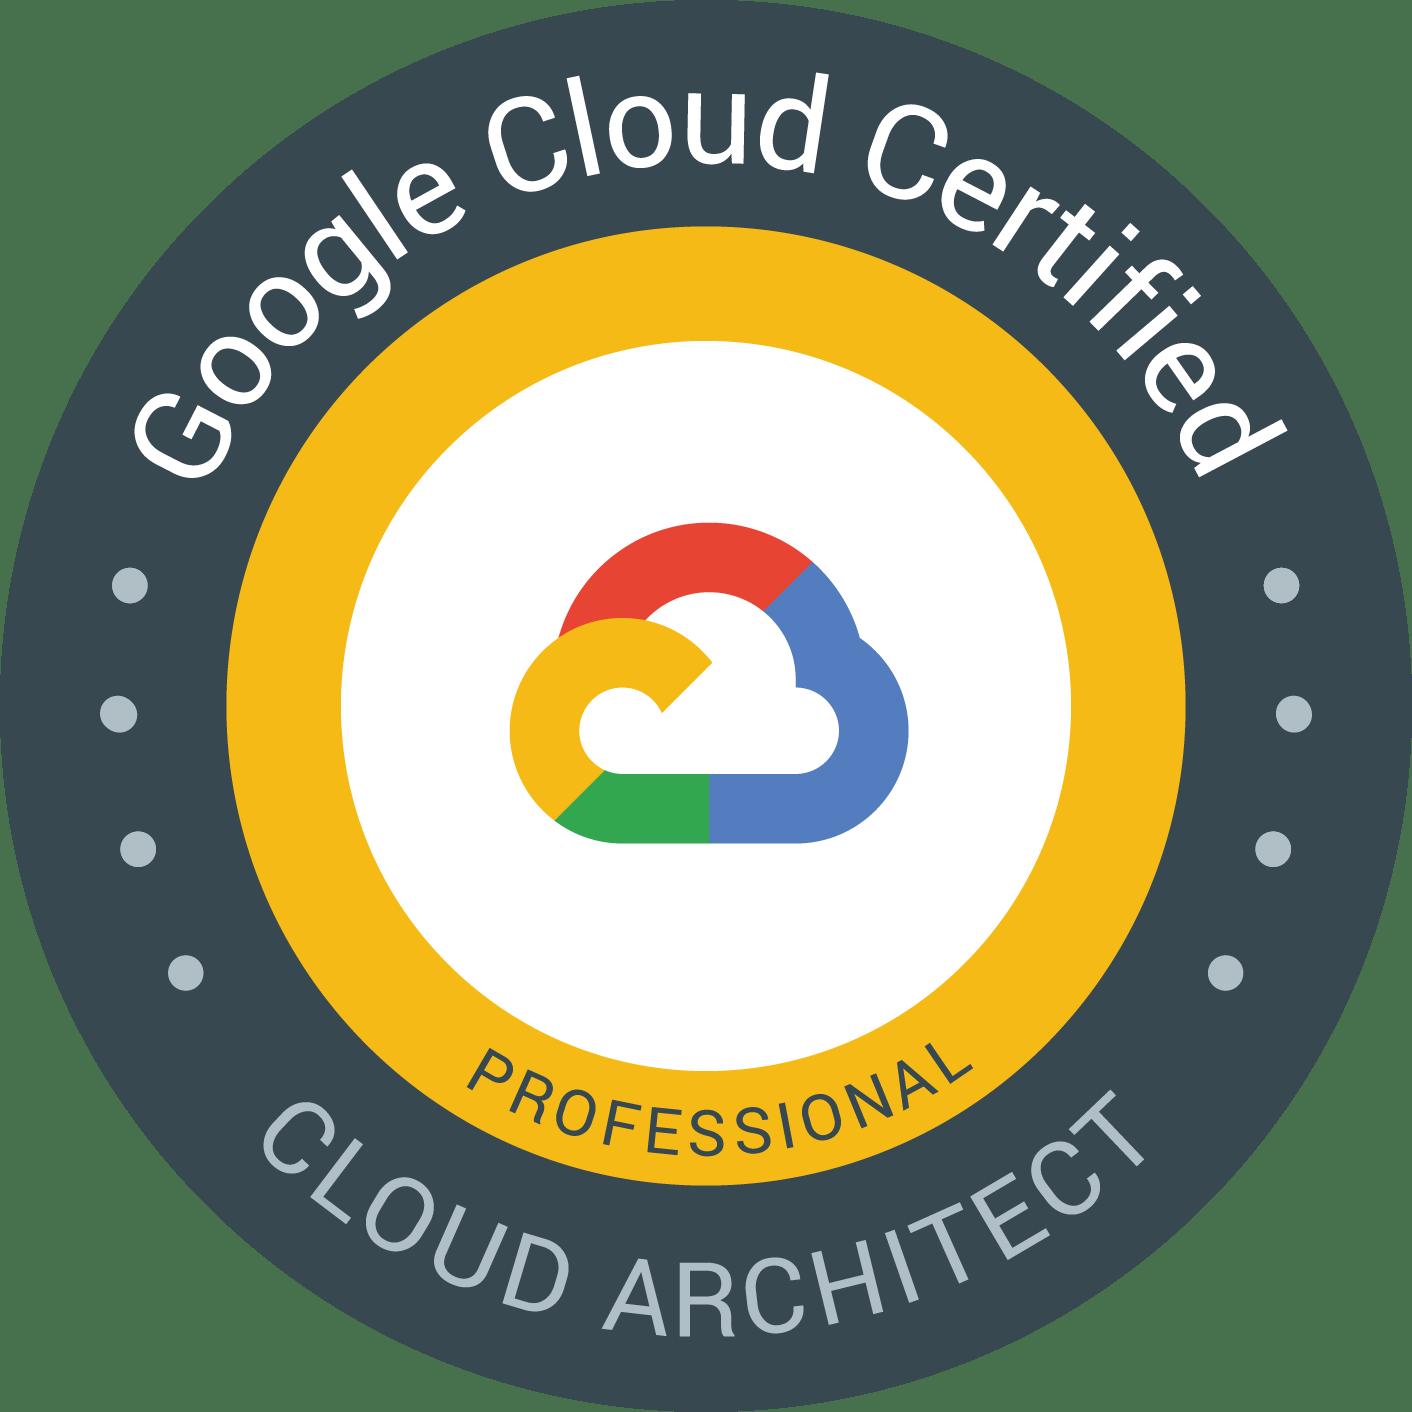 Professional Cloud Architect 認定資格 バッジ